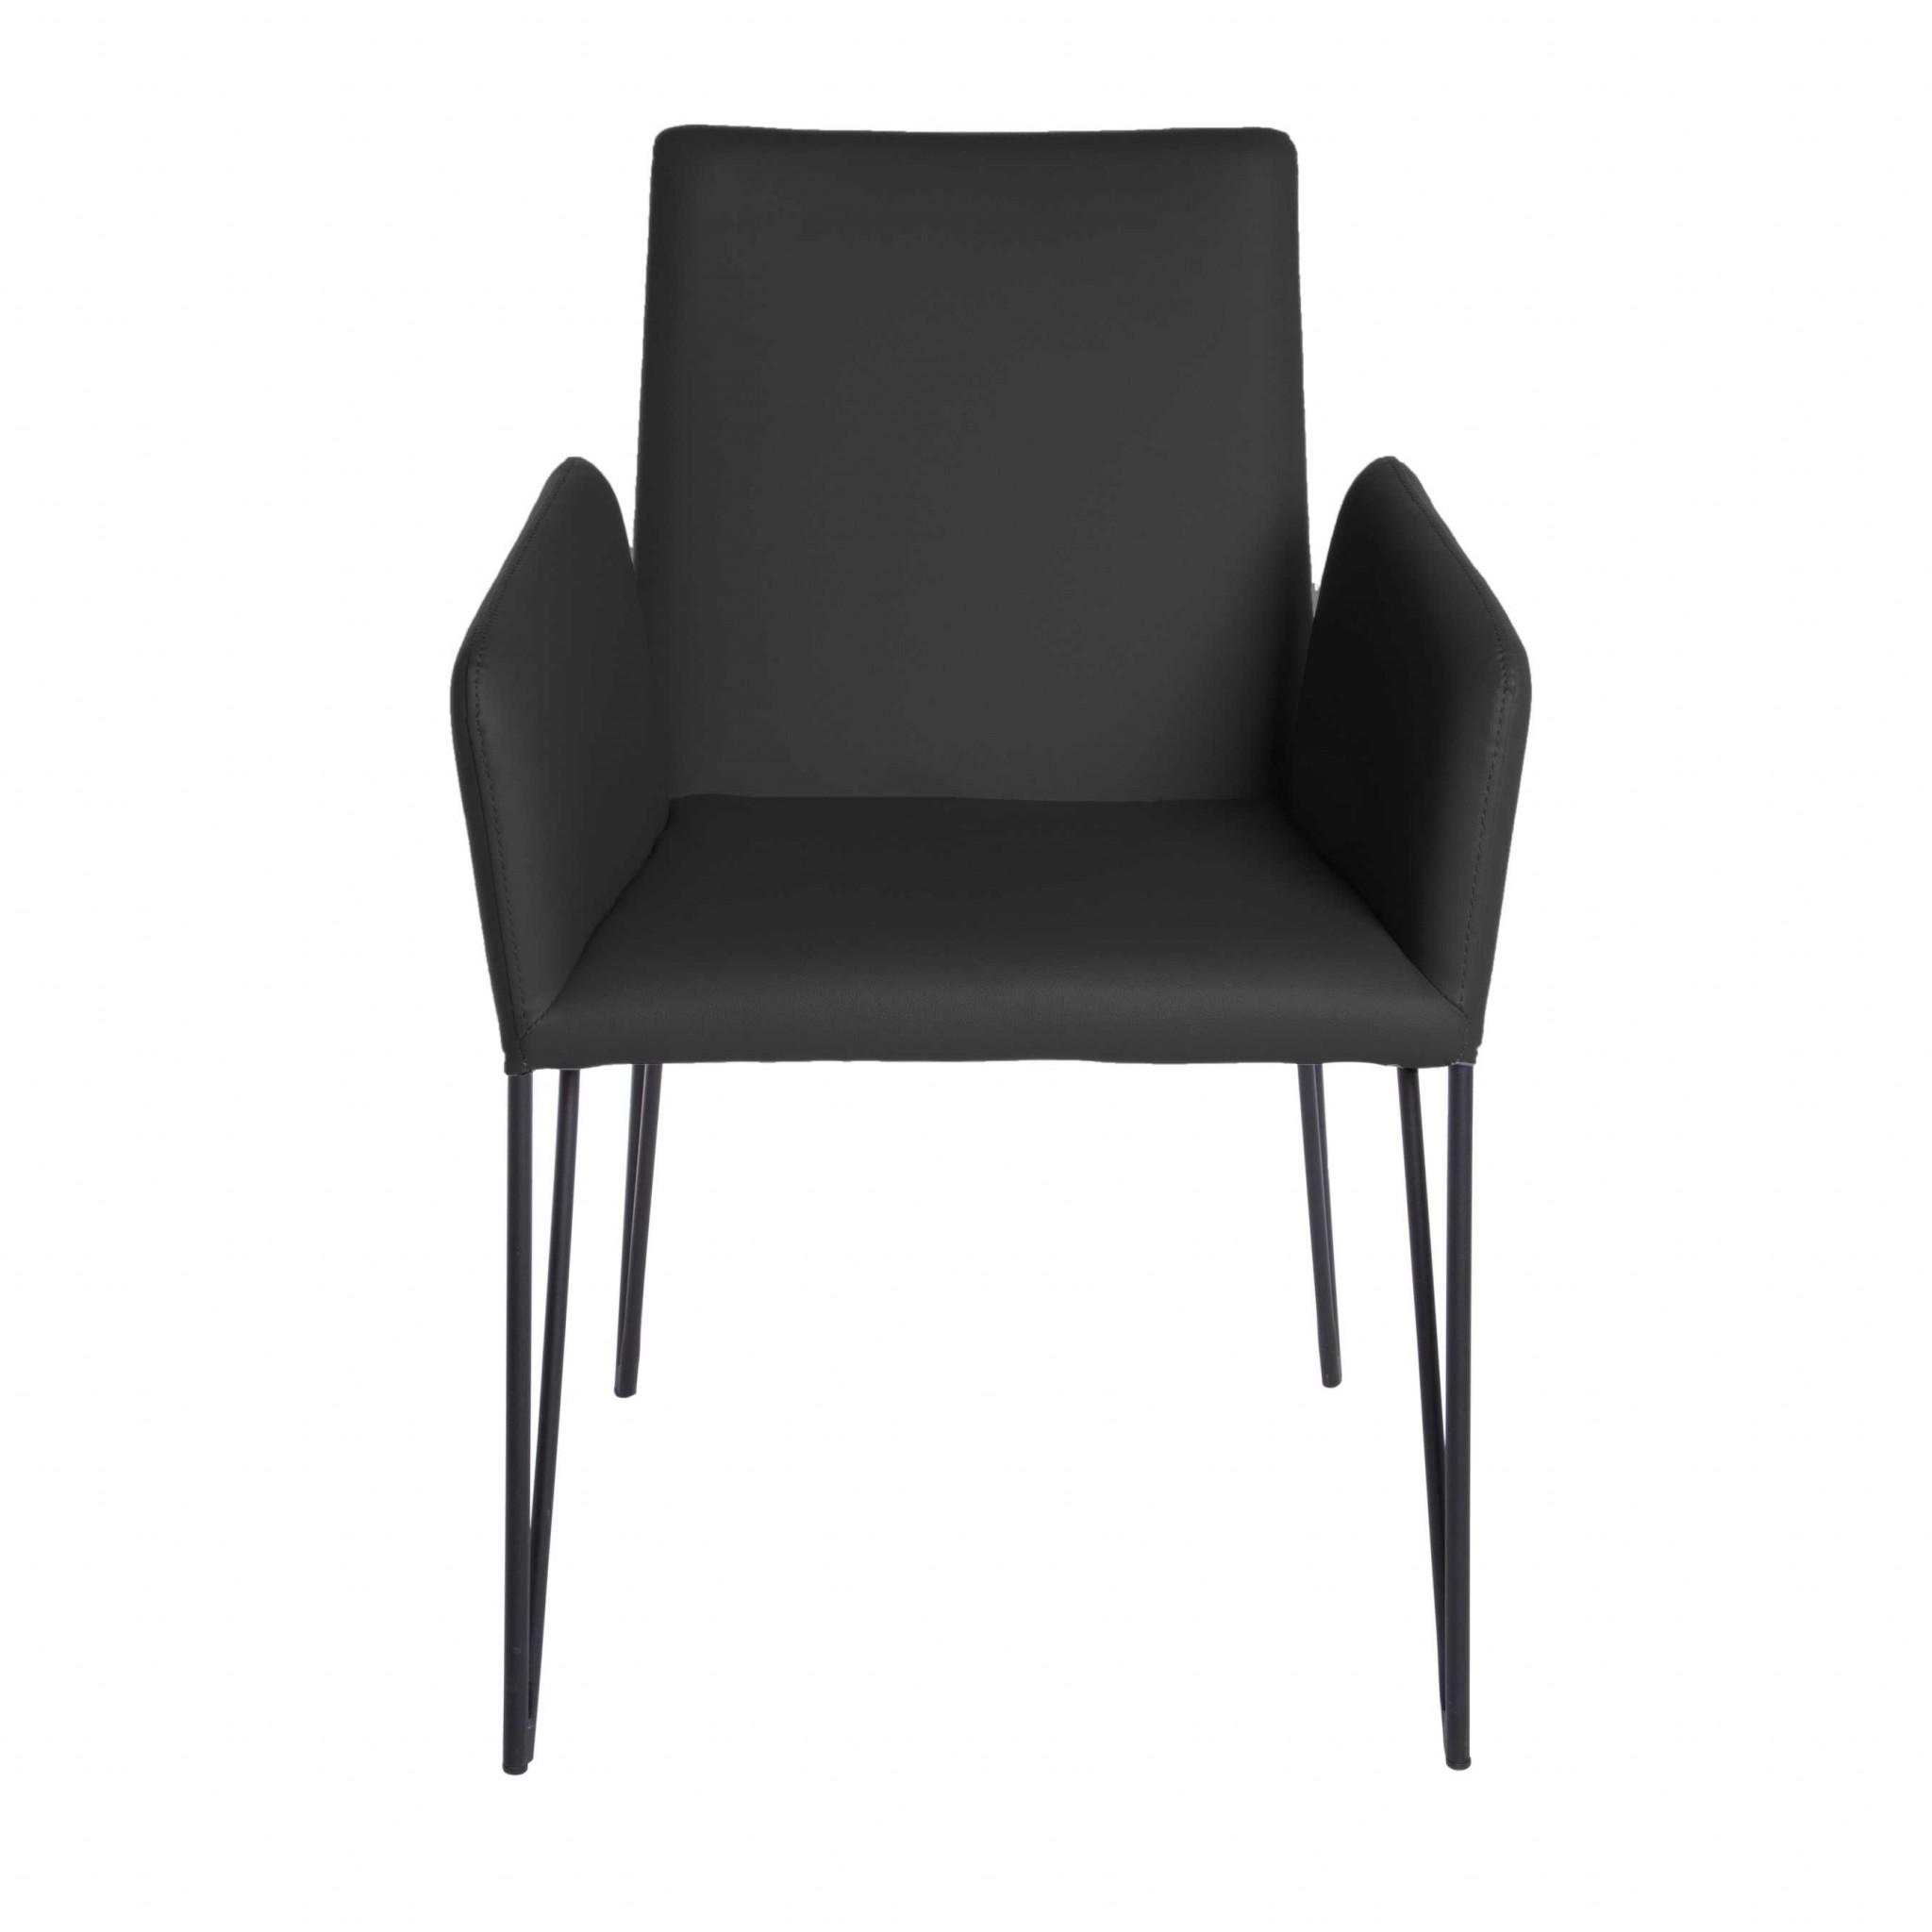 "22.45"" X 23.04"" X 35.63"" Black Leatherette over Foam Arm Chair"